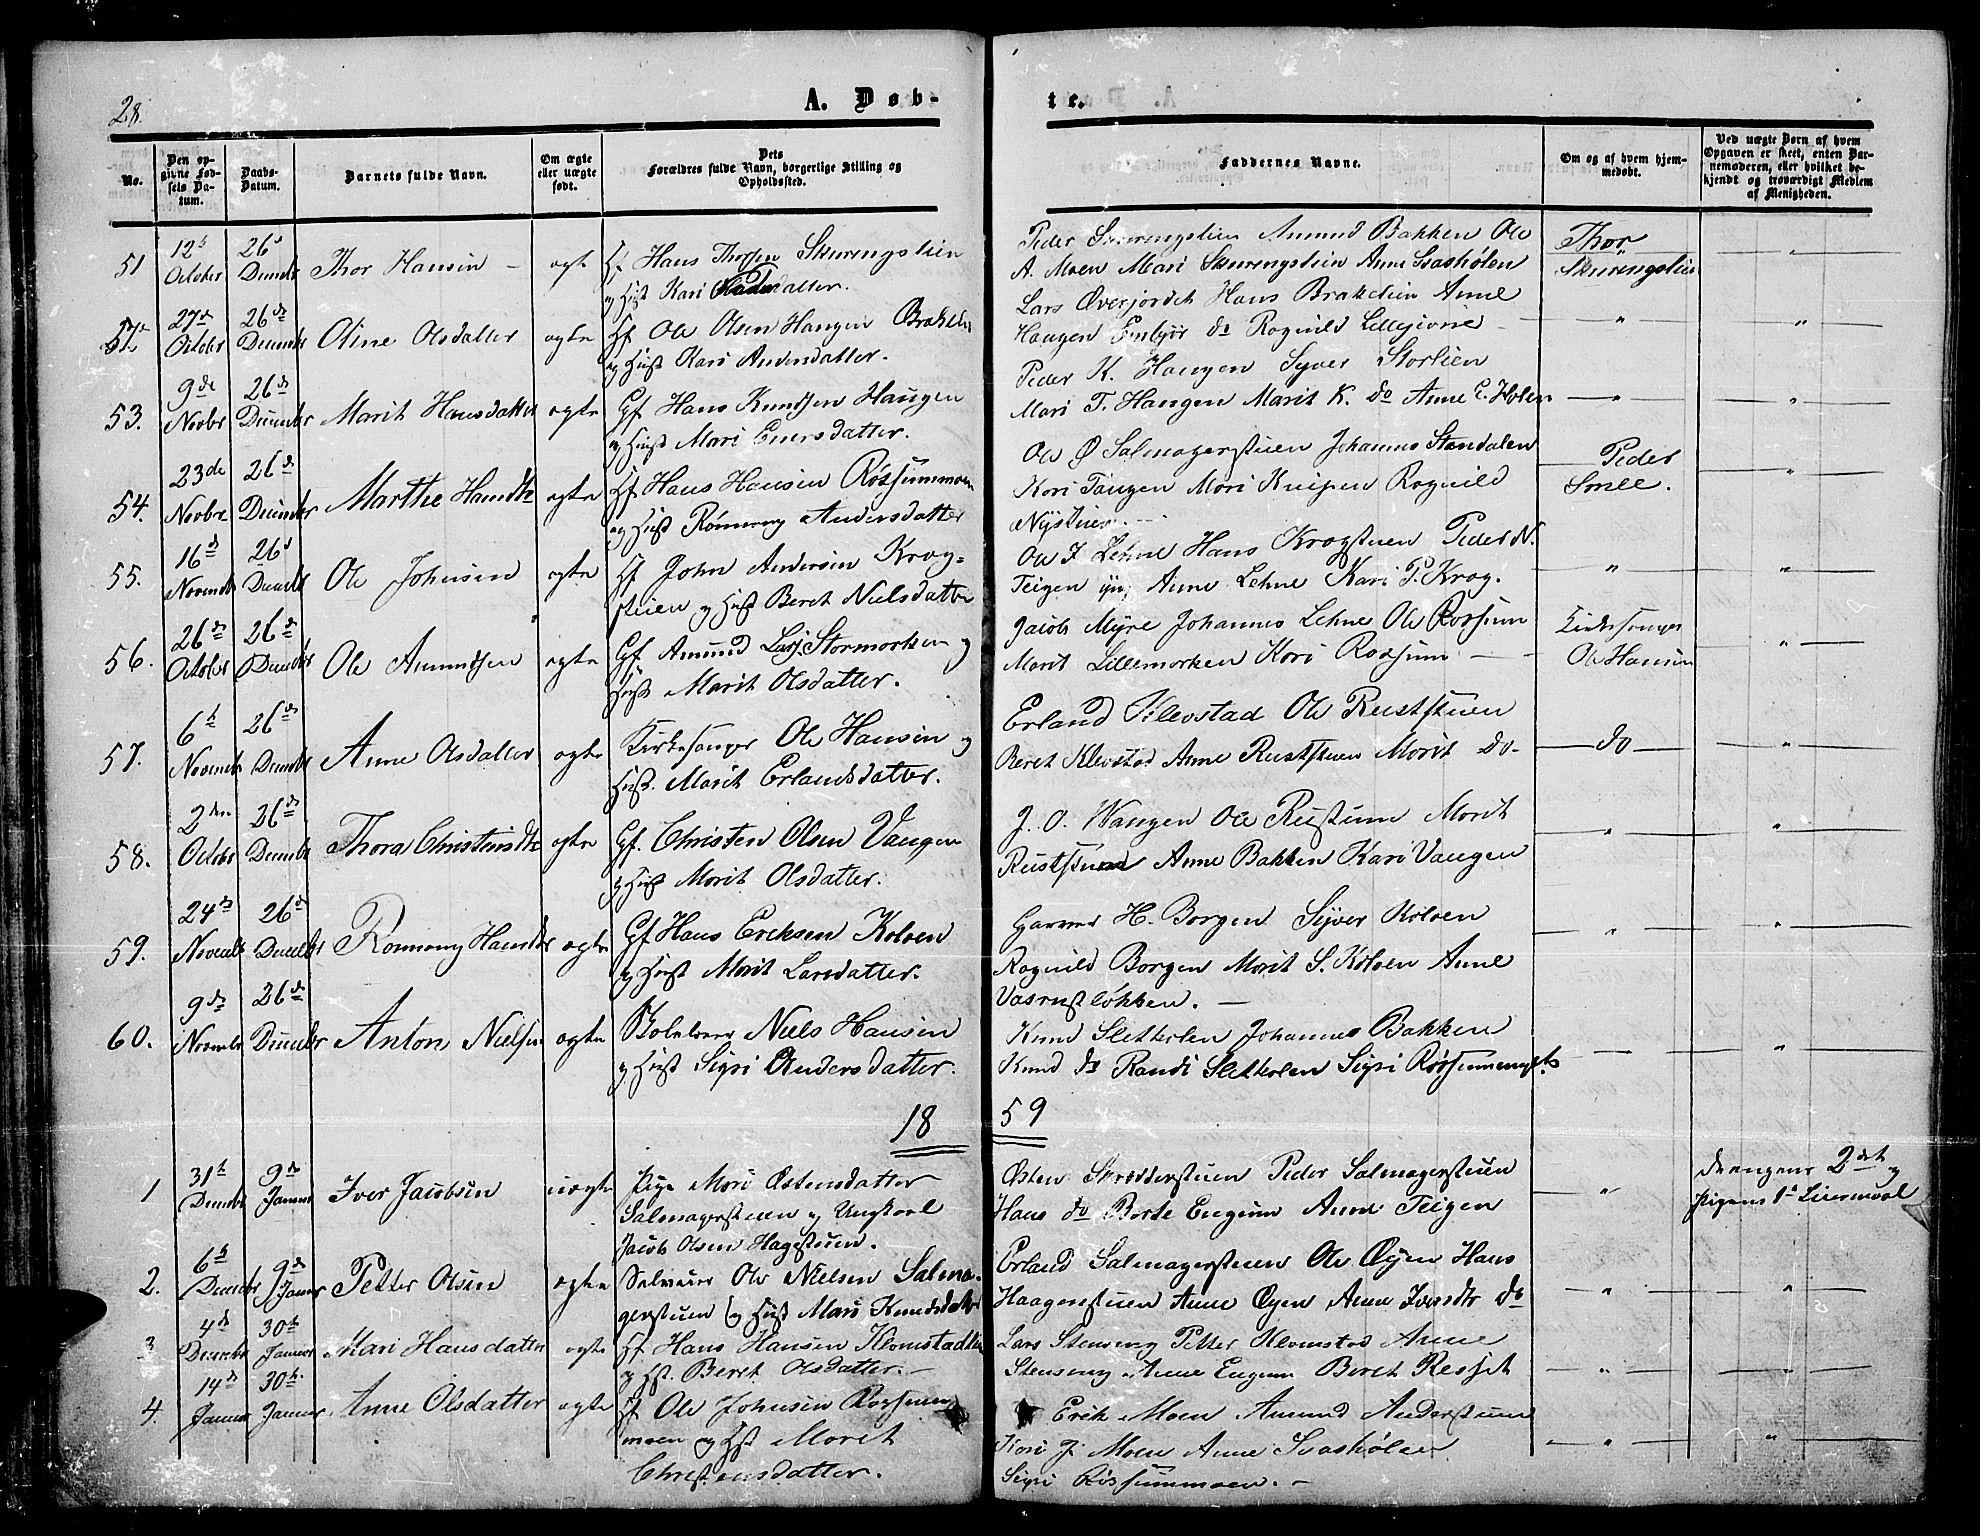 SAH, Nord-Fron prestekontor, Klokkerbok nr. 3, 1851-1886, s. 28